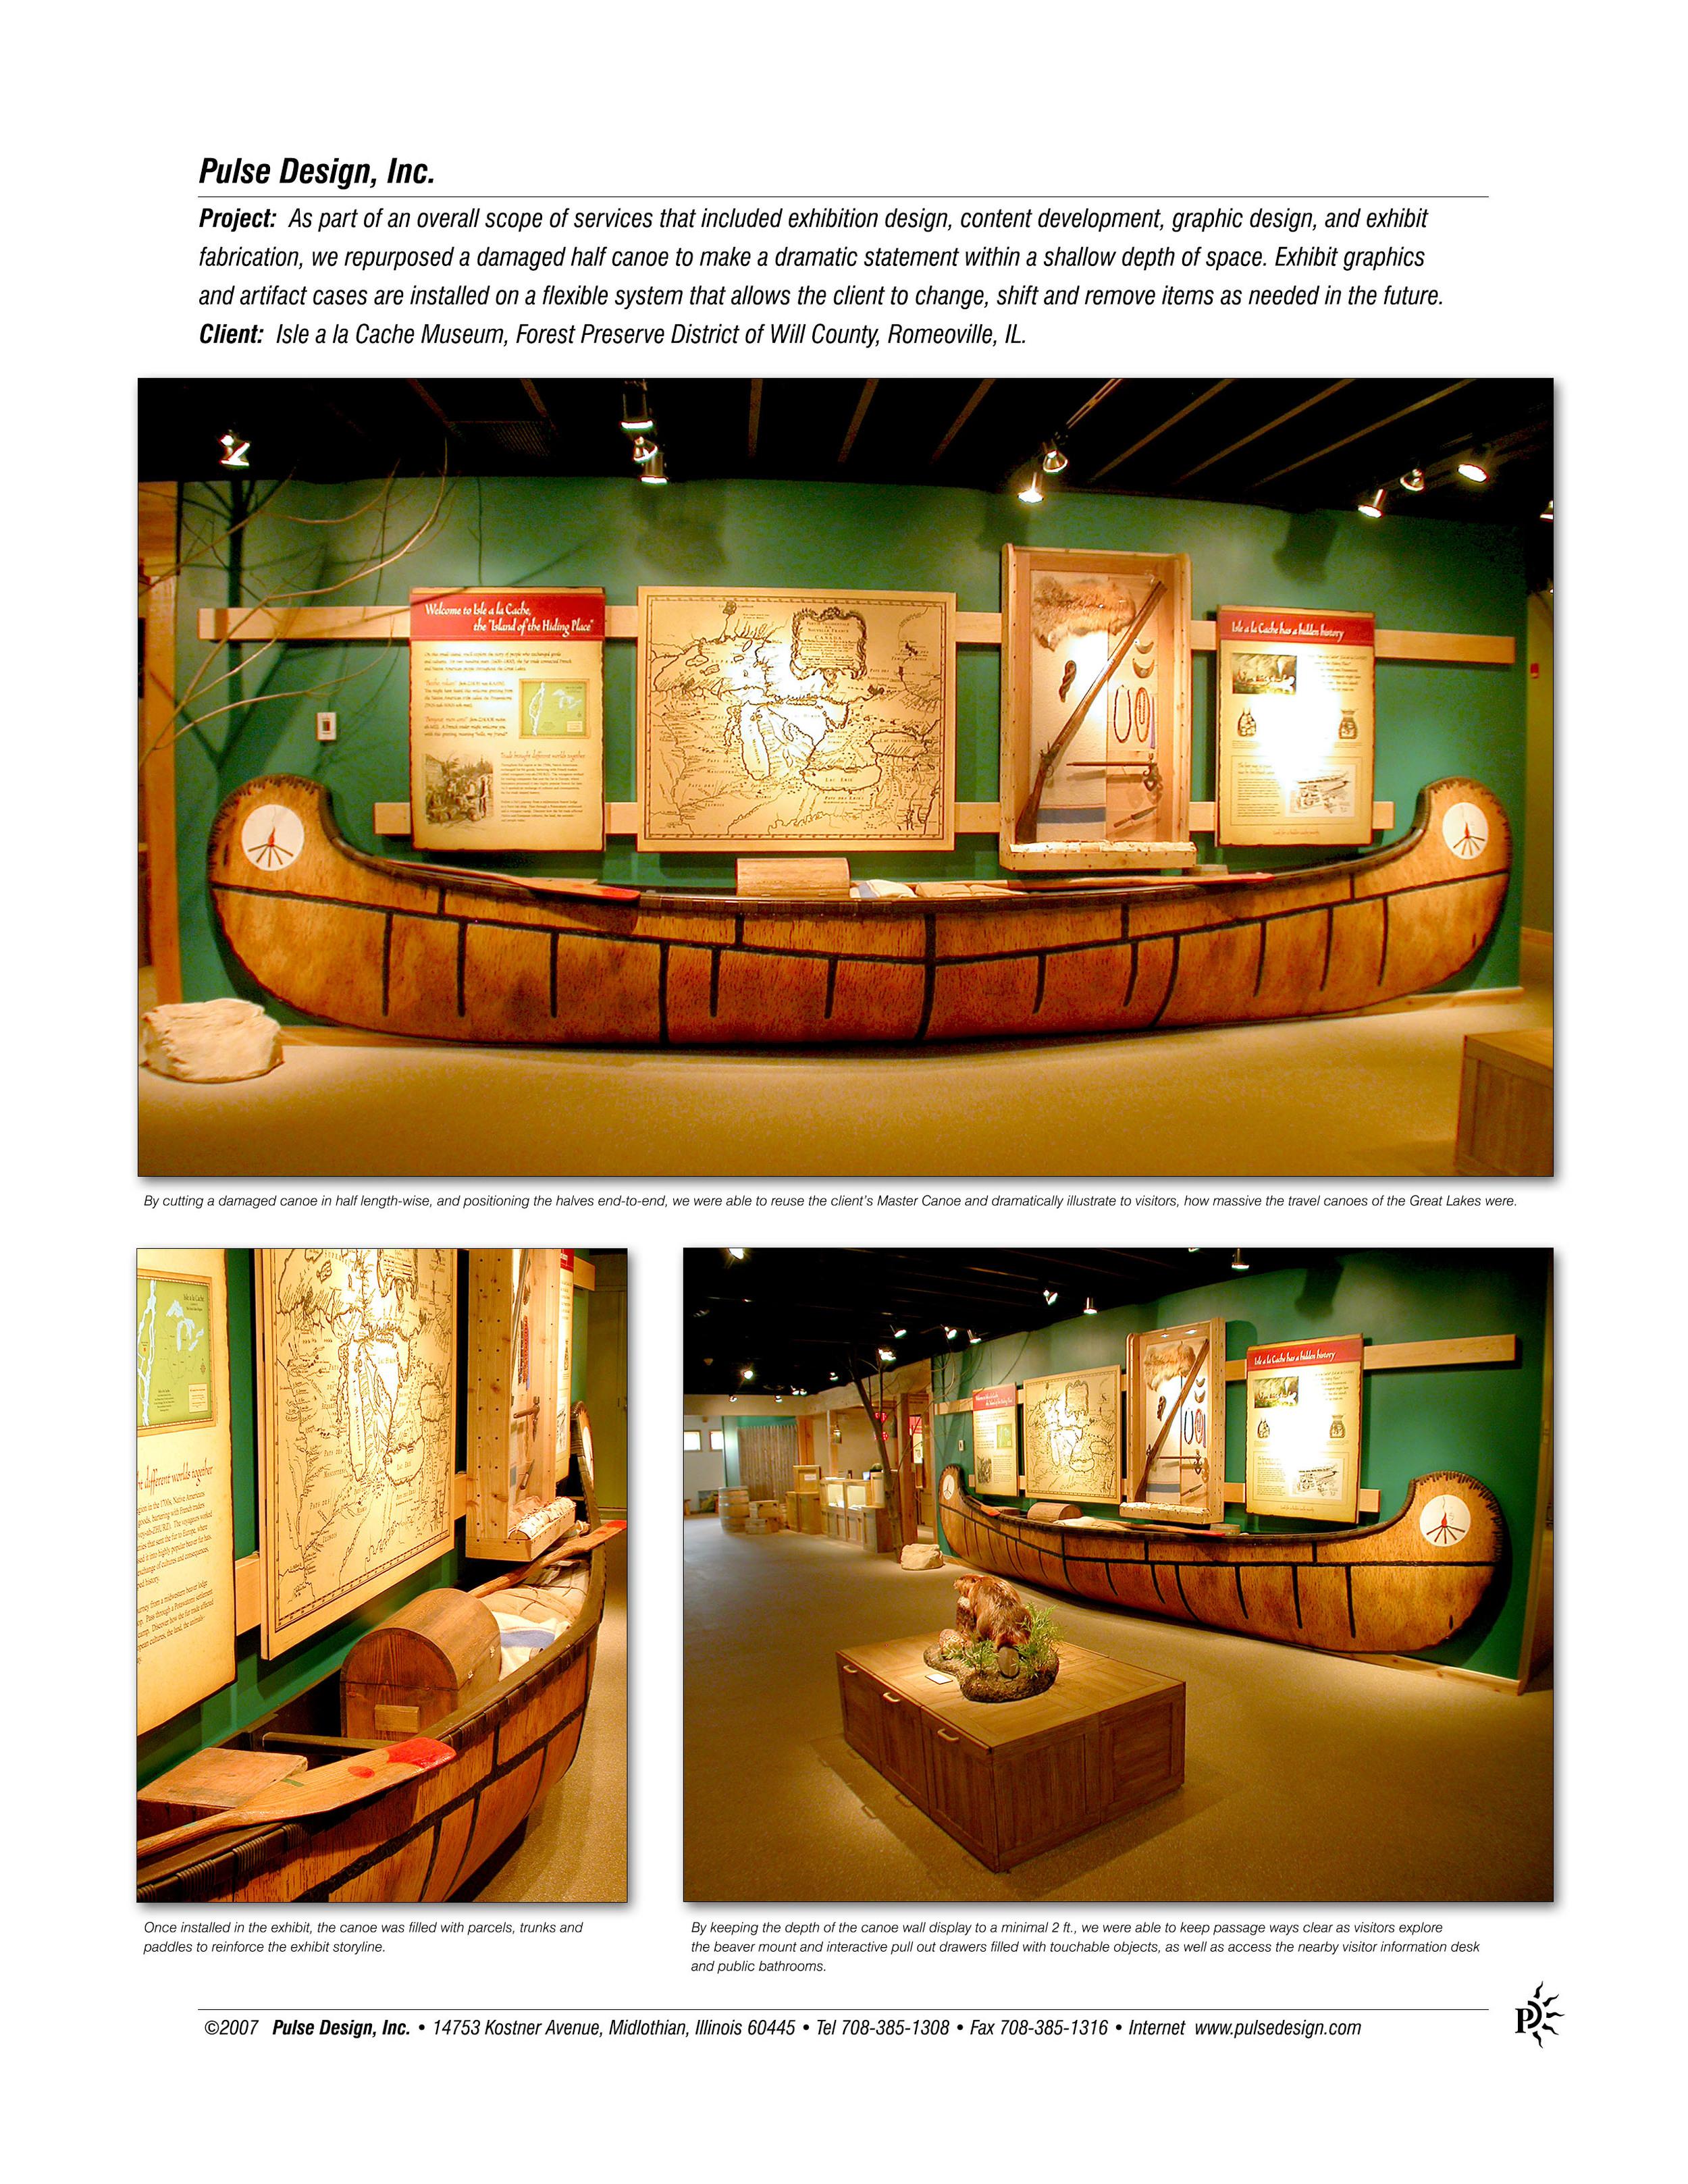 Isla-a-la-Cache-Exhibit-Canoe-Pulse-Design-Inc.jpg